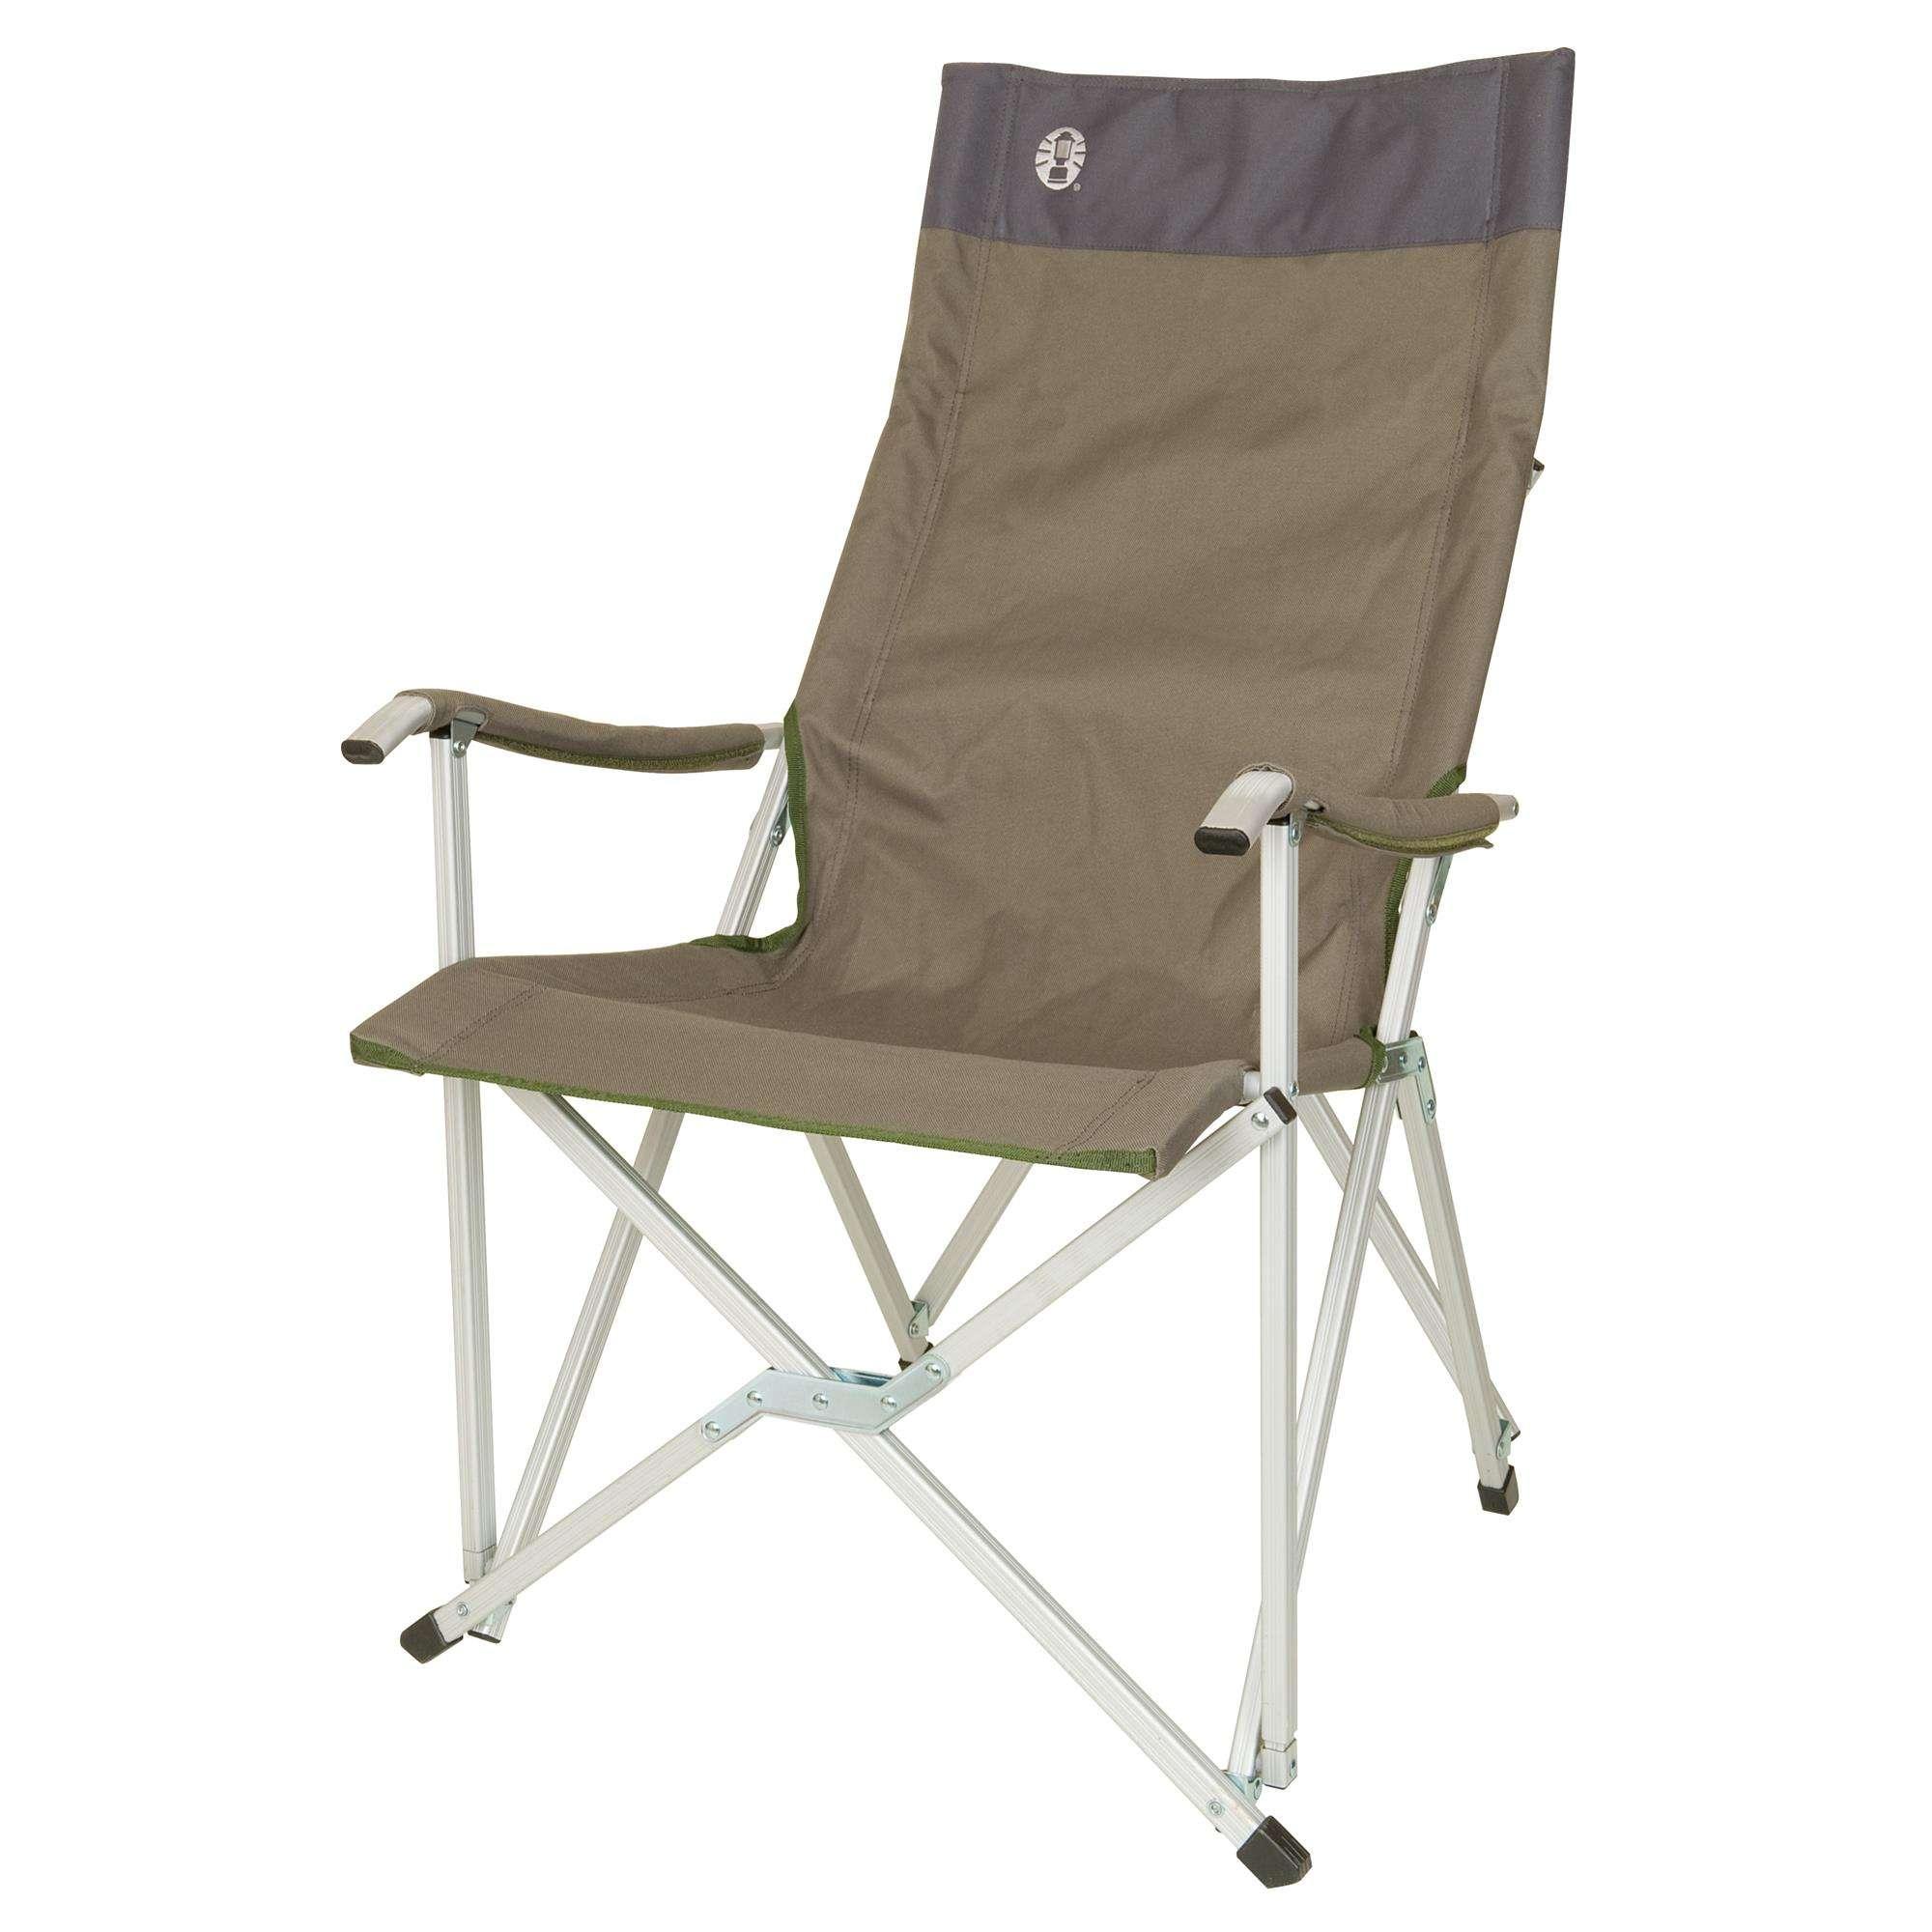 Campingstuhl Coleman.Camping Möbel Coleman Campingstuhl Deck Chair Khaki